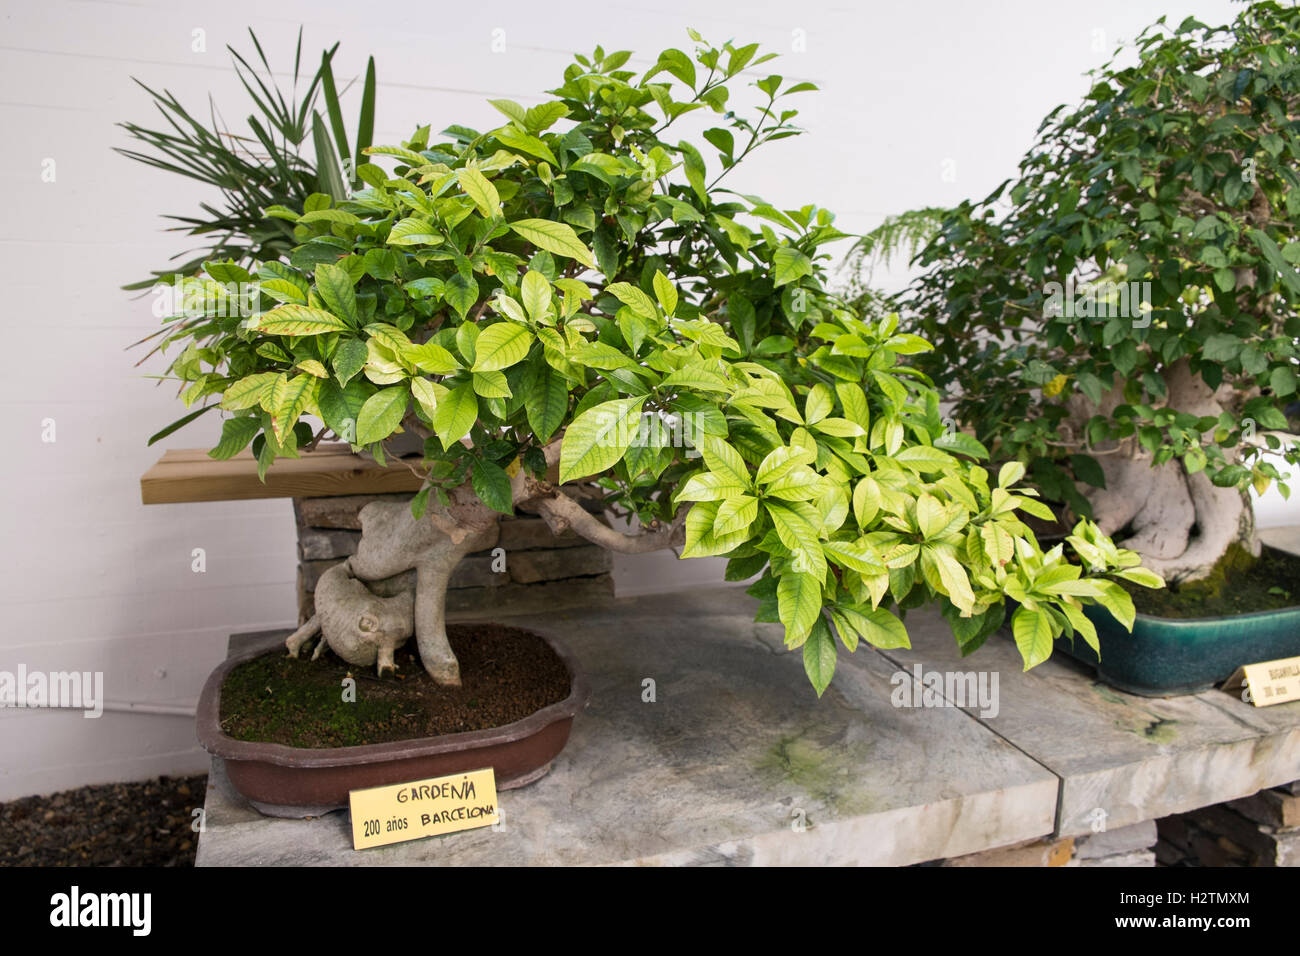 200 Years Old Gardenia Bonsai Tree. Marbella Bonsai Museum. Málaga, Costa  Del Sol.